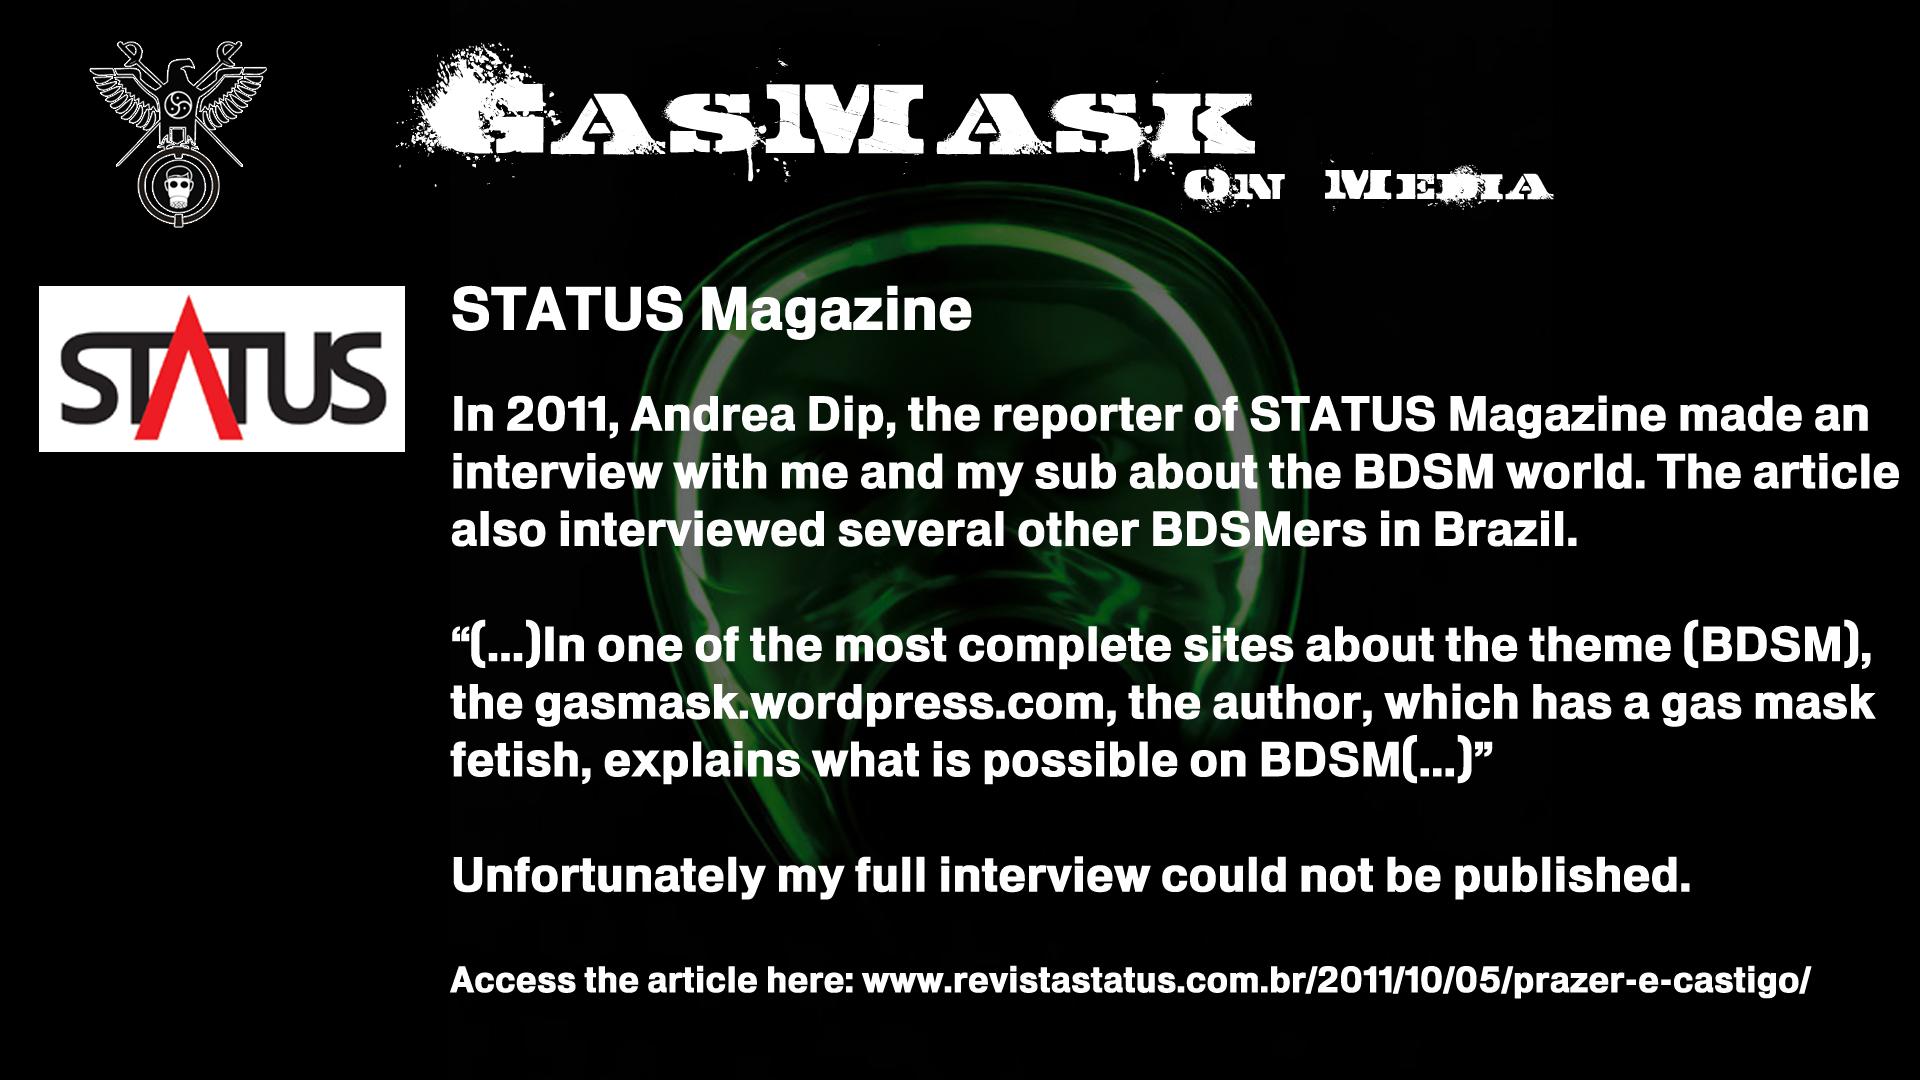 2011 - Status Magazine